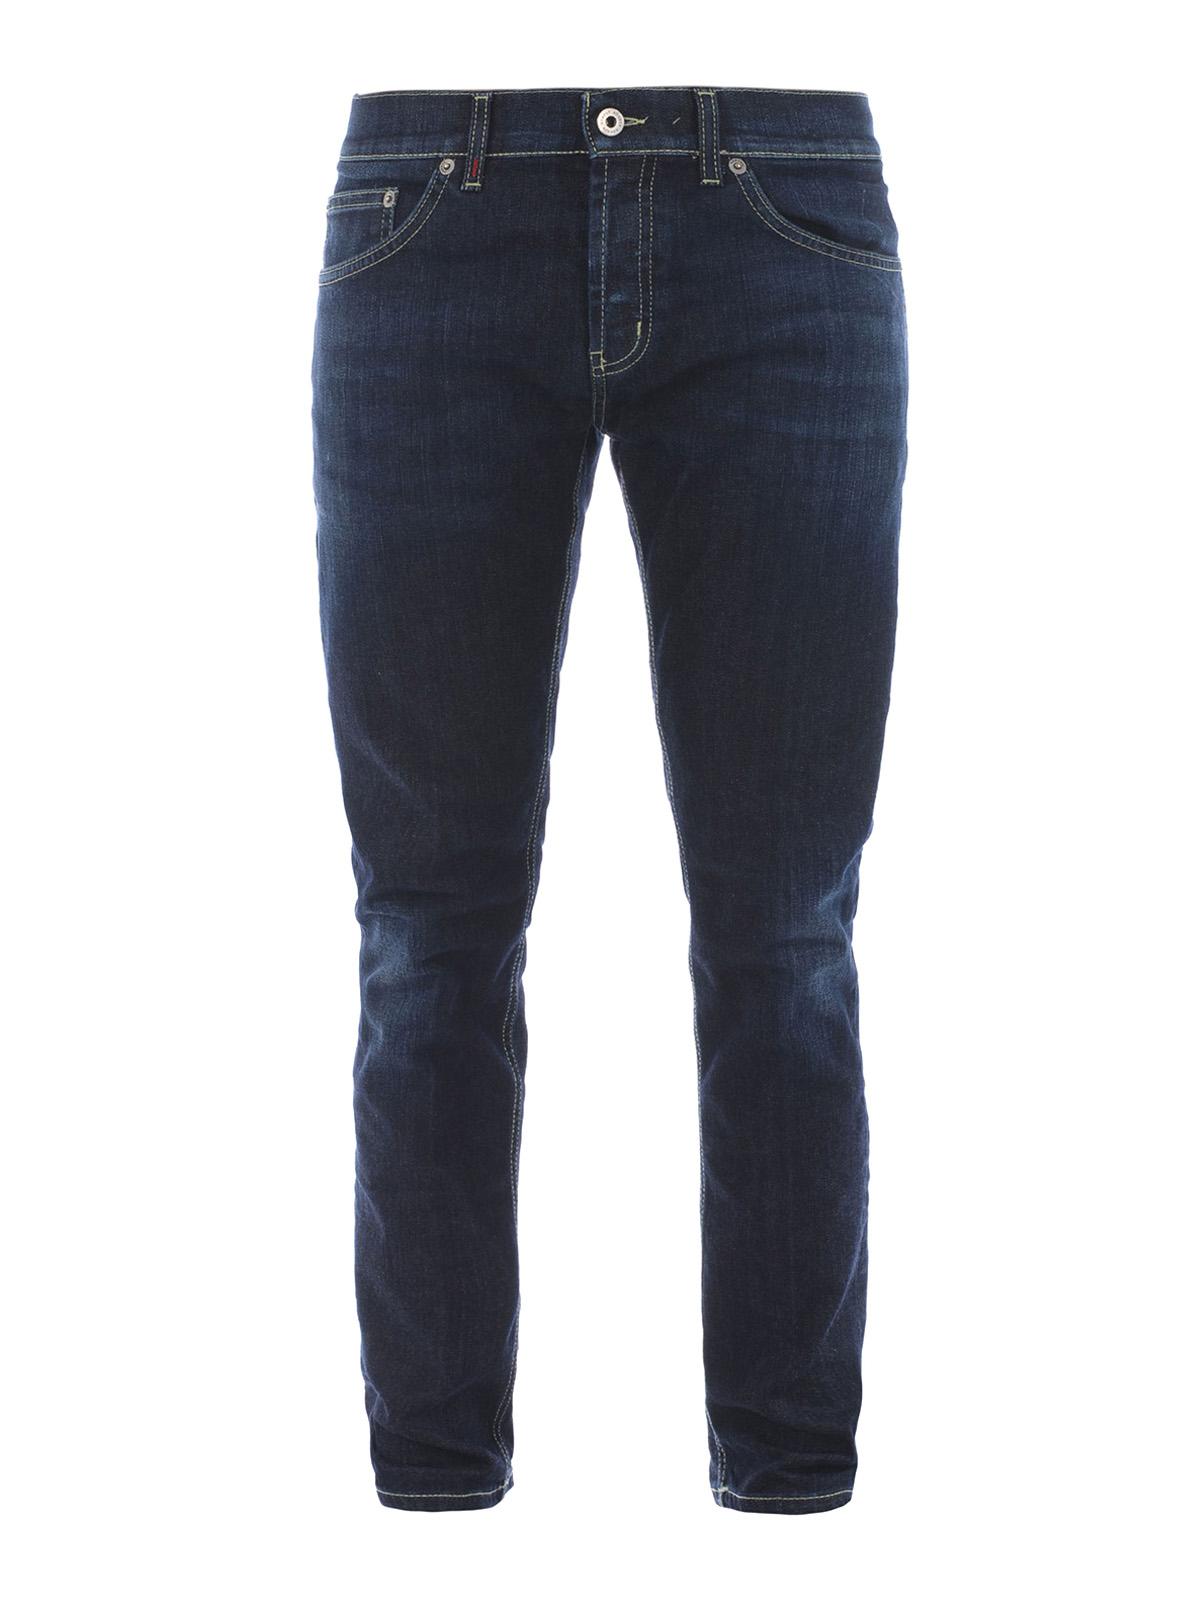 mius stretch denim slim jeans by dondup straight leg jeans ikrix. Black Bedroom Furniture Sets. Home Design Ideas